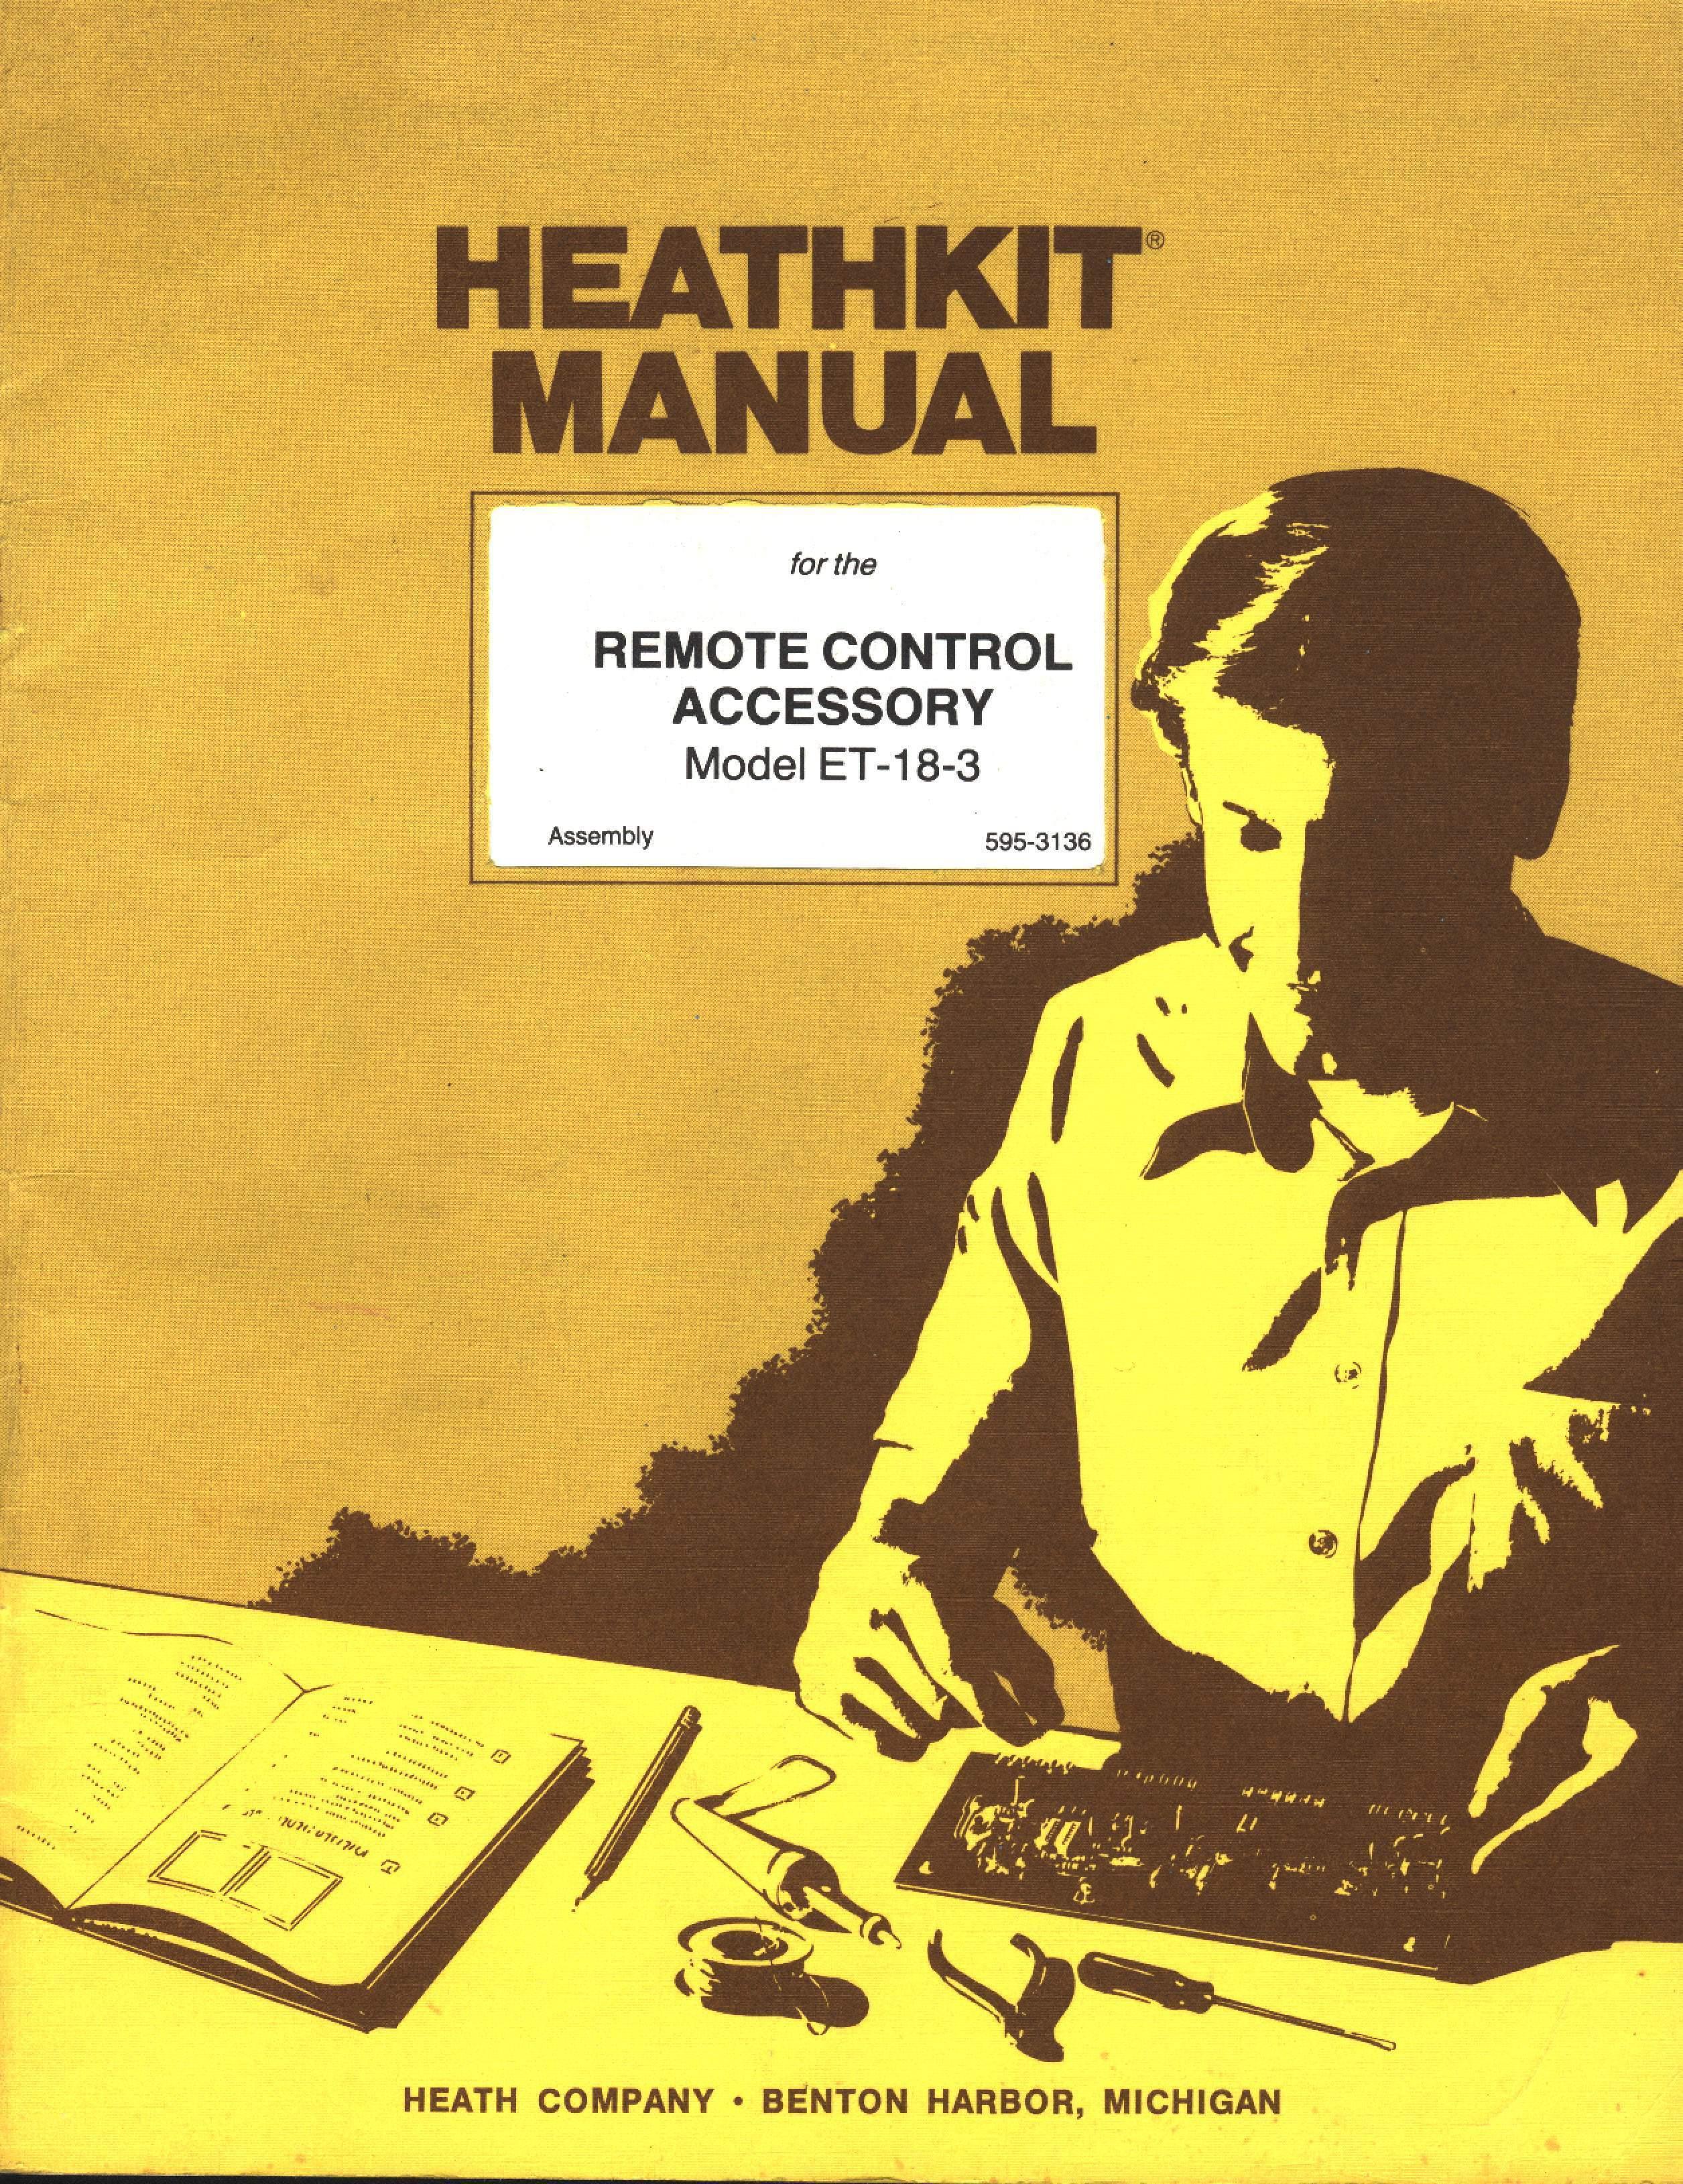 robot manuals the old robot s web site rh theoldrobots com heathkit manuals download heathkit manuals ebay